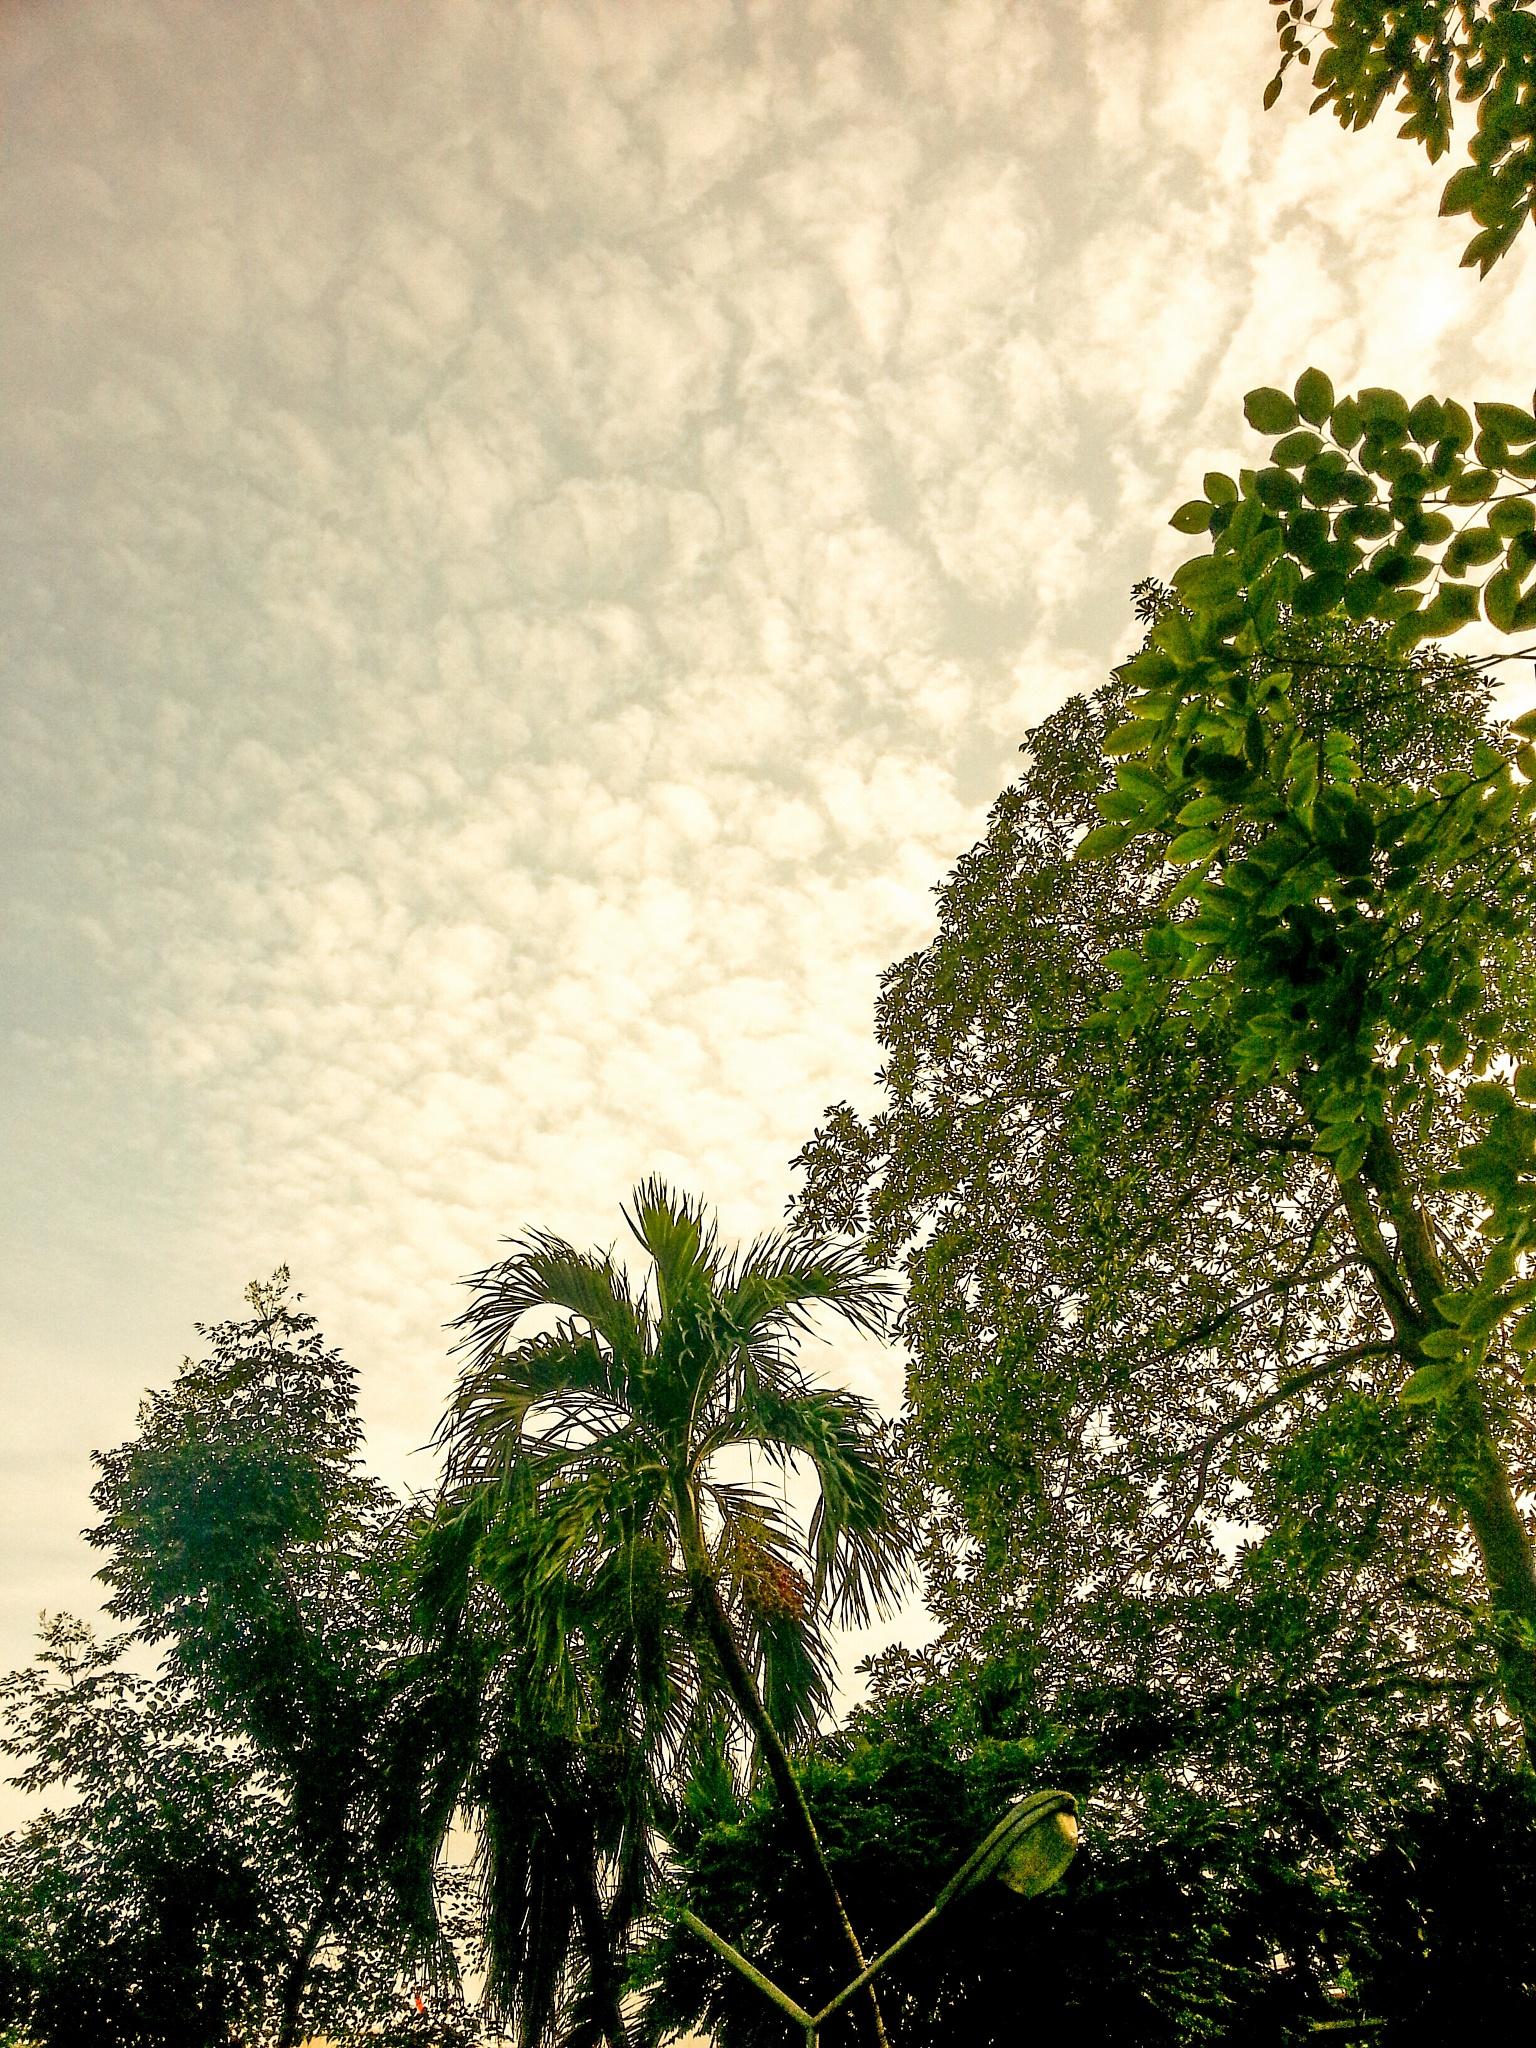 trees  by dangtrumpet